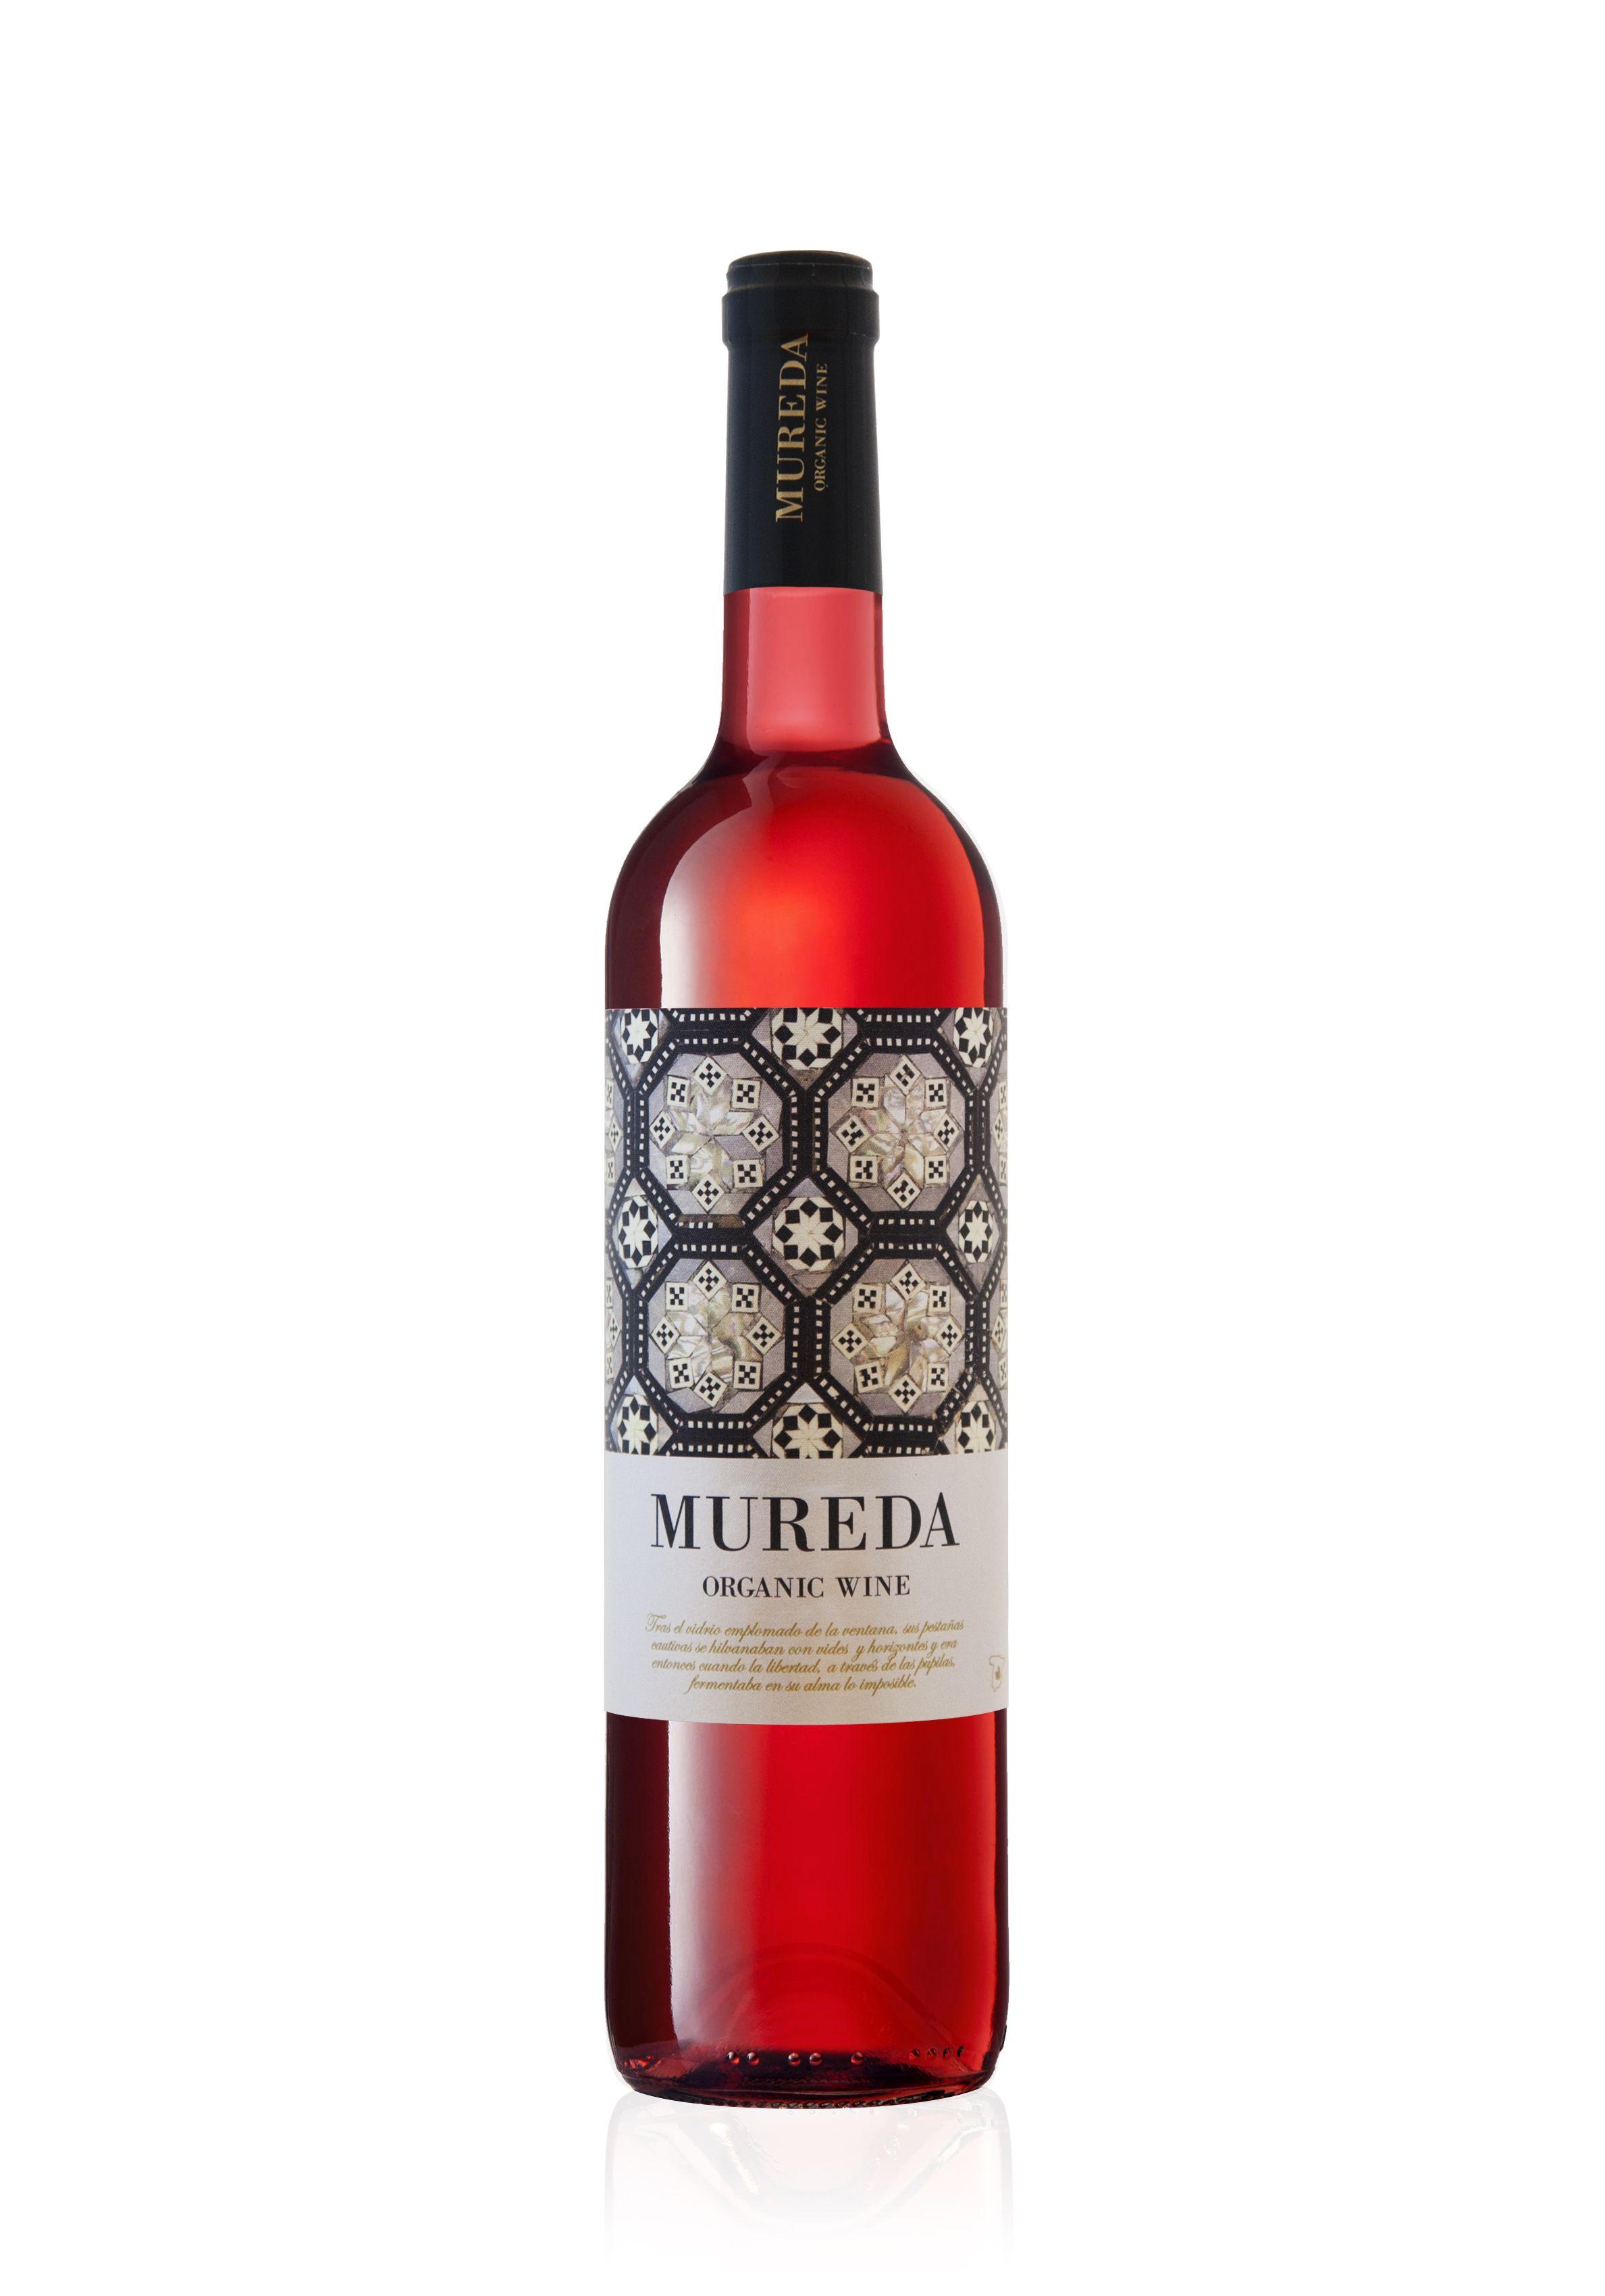 Mureda Organic Wine Rosado Packaging Realizado Para El Mercado Chino Y Ruso Wine Packaging Design Wine Label Packaging Wine Label Art